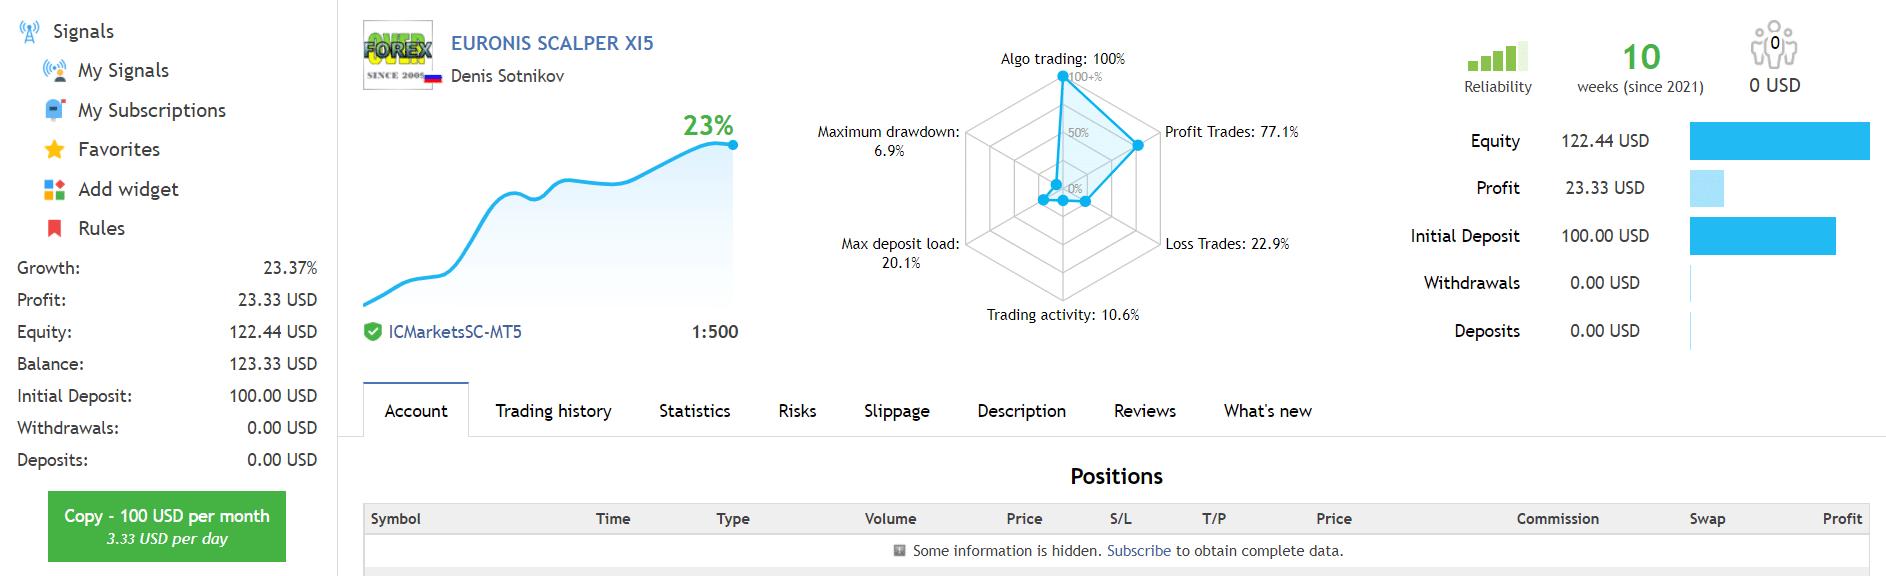 Euronis Scalper live trading results on fxblue.